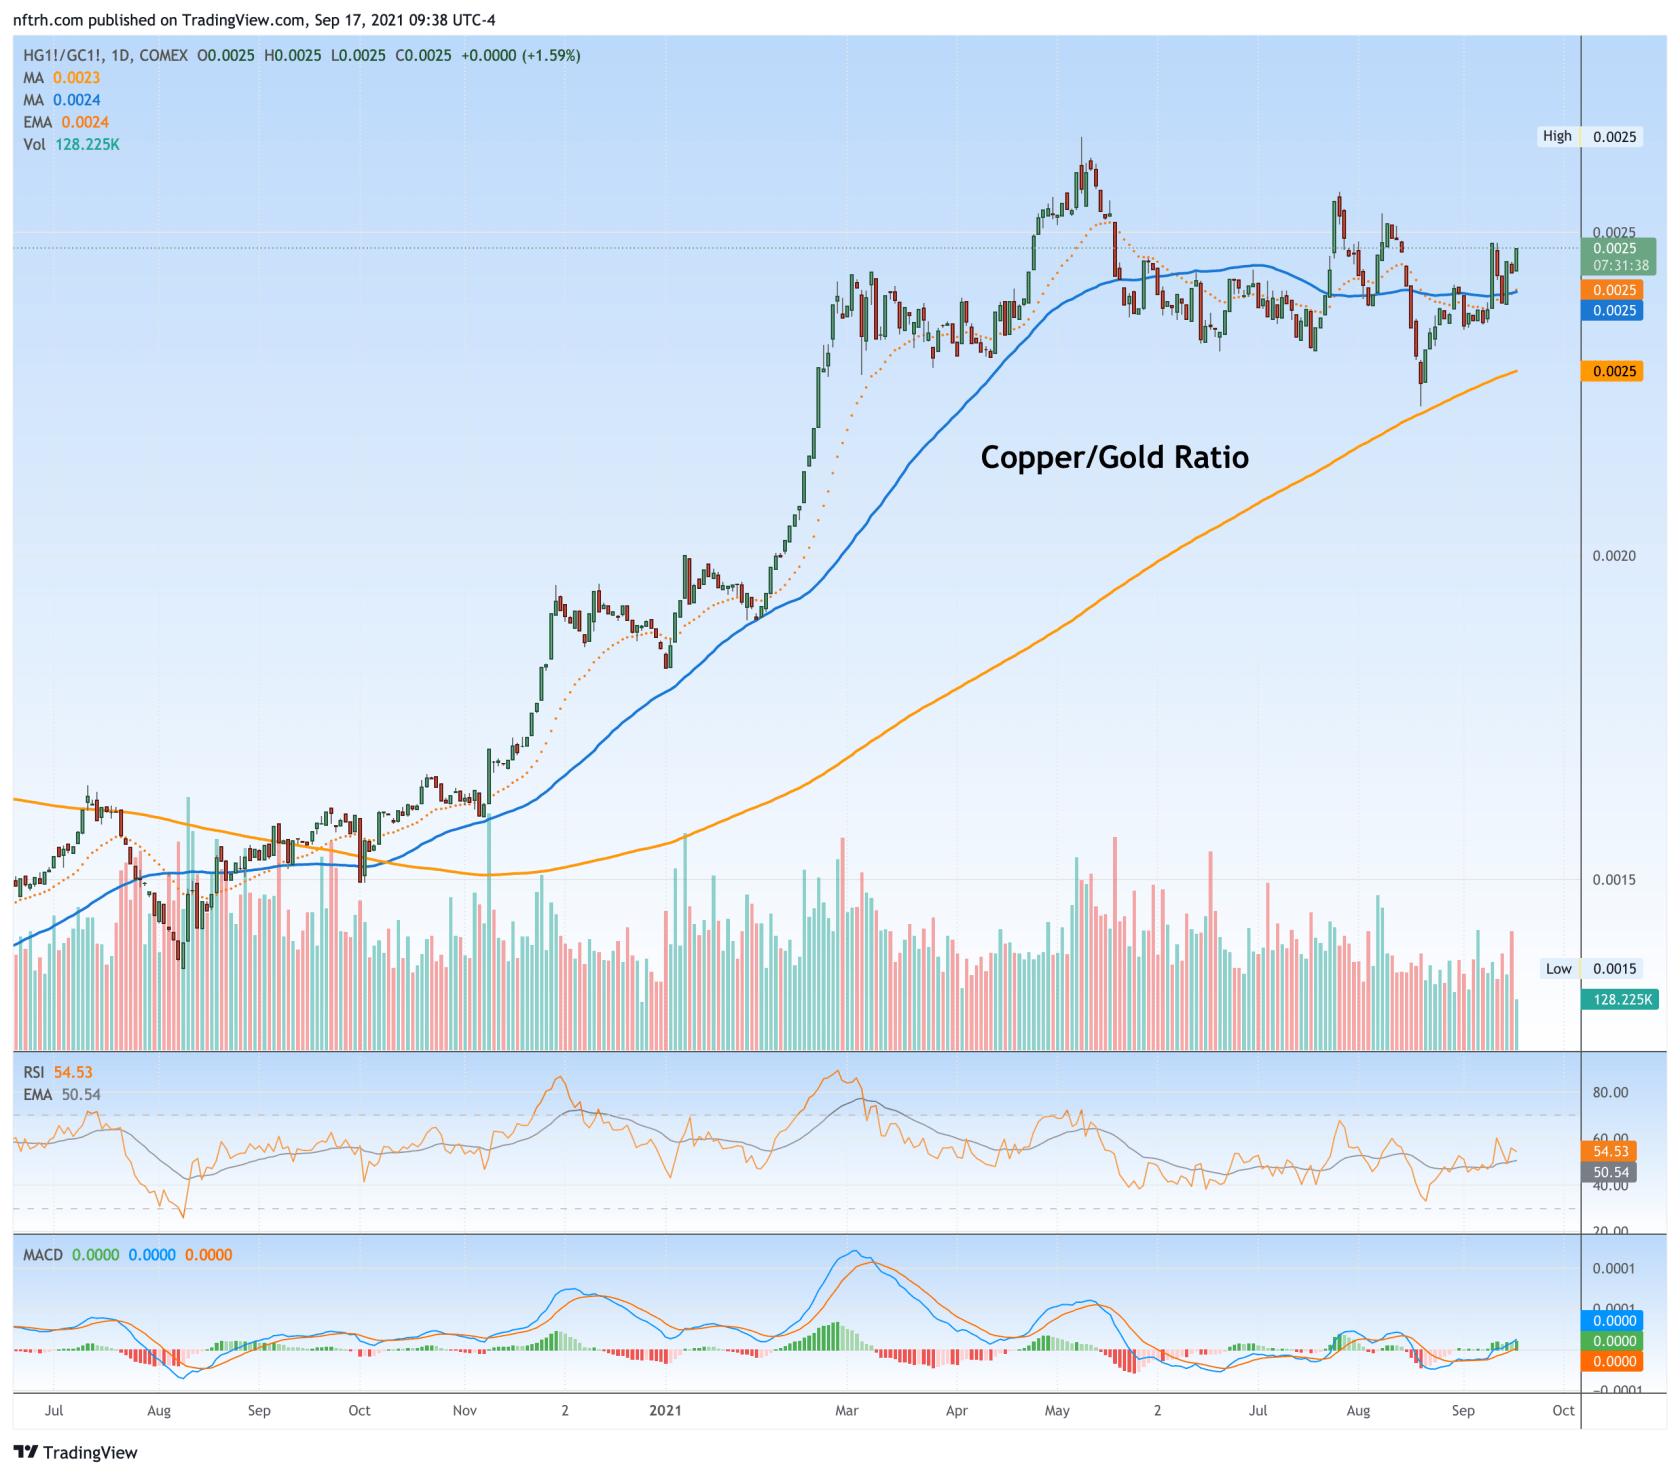 Copper:Gold Ratio.